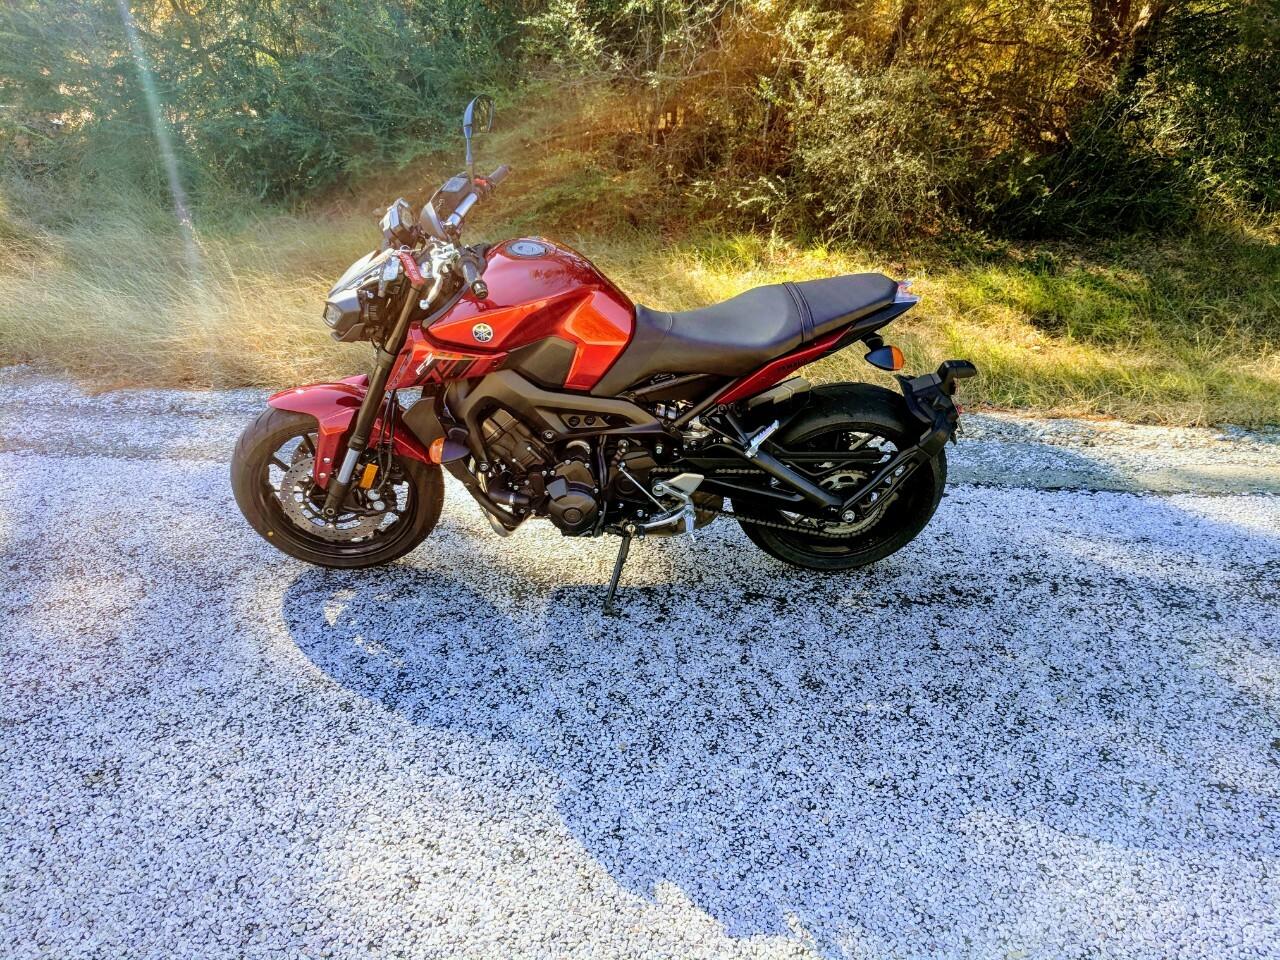 Texas - Used Yamaha For Sale - Yamaha Engines Motorcycles